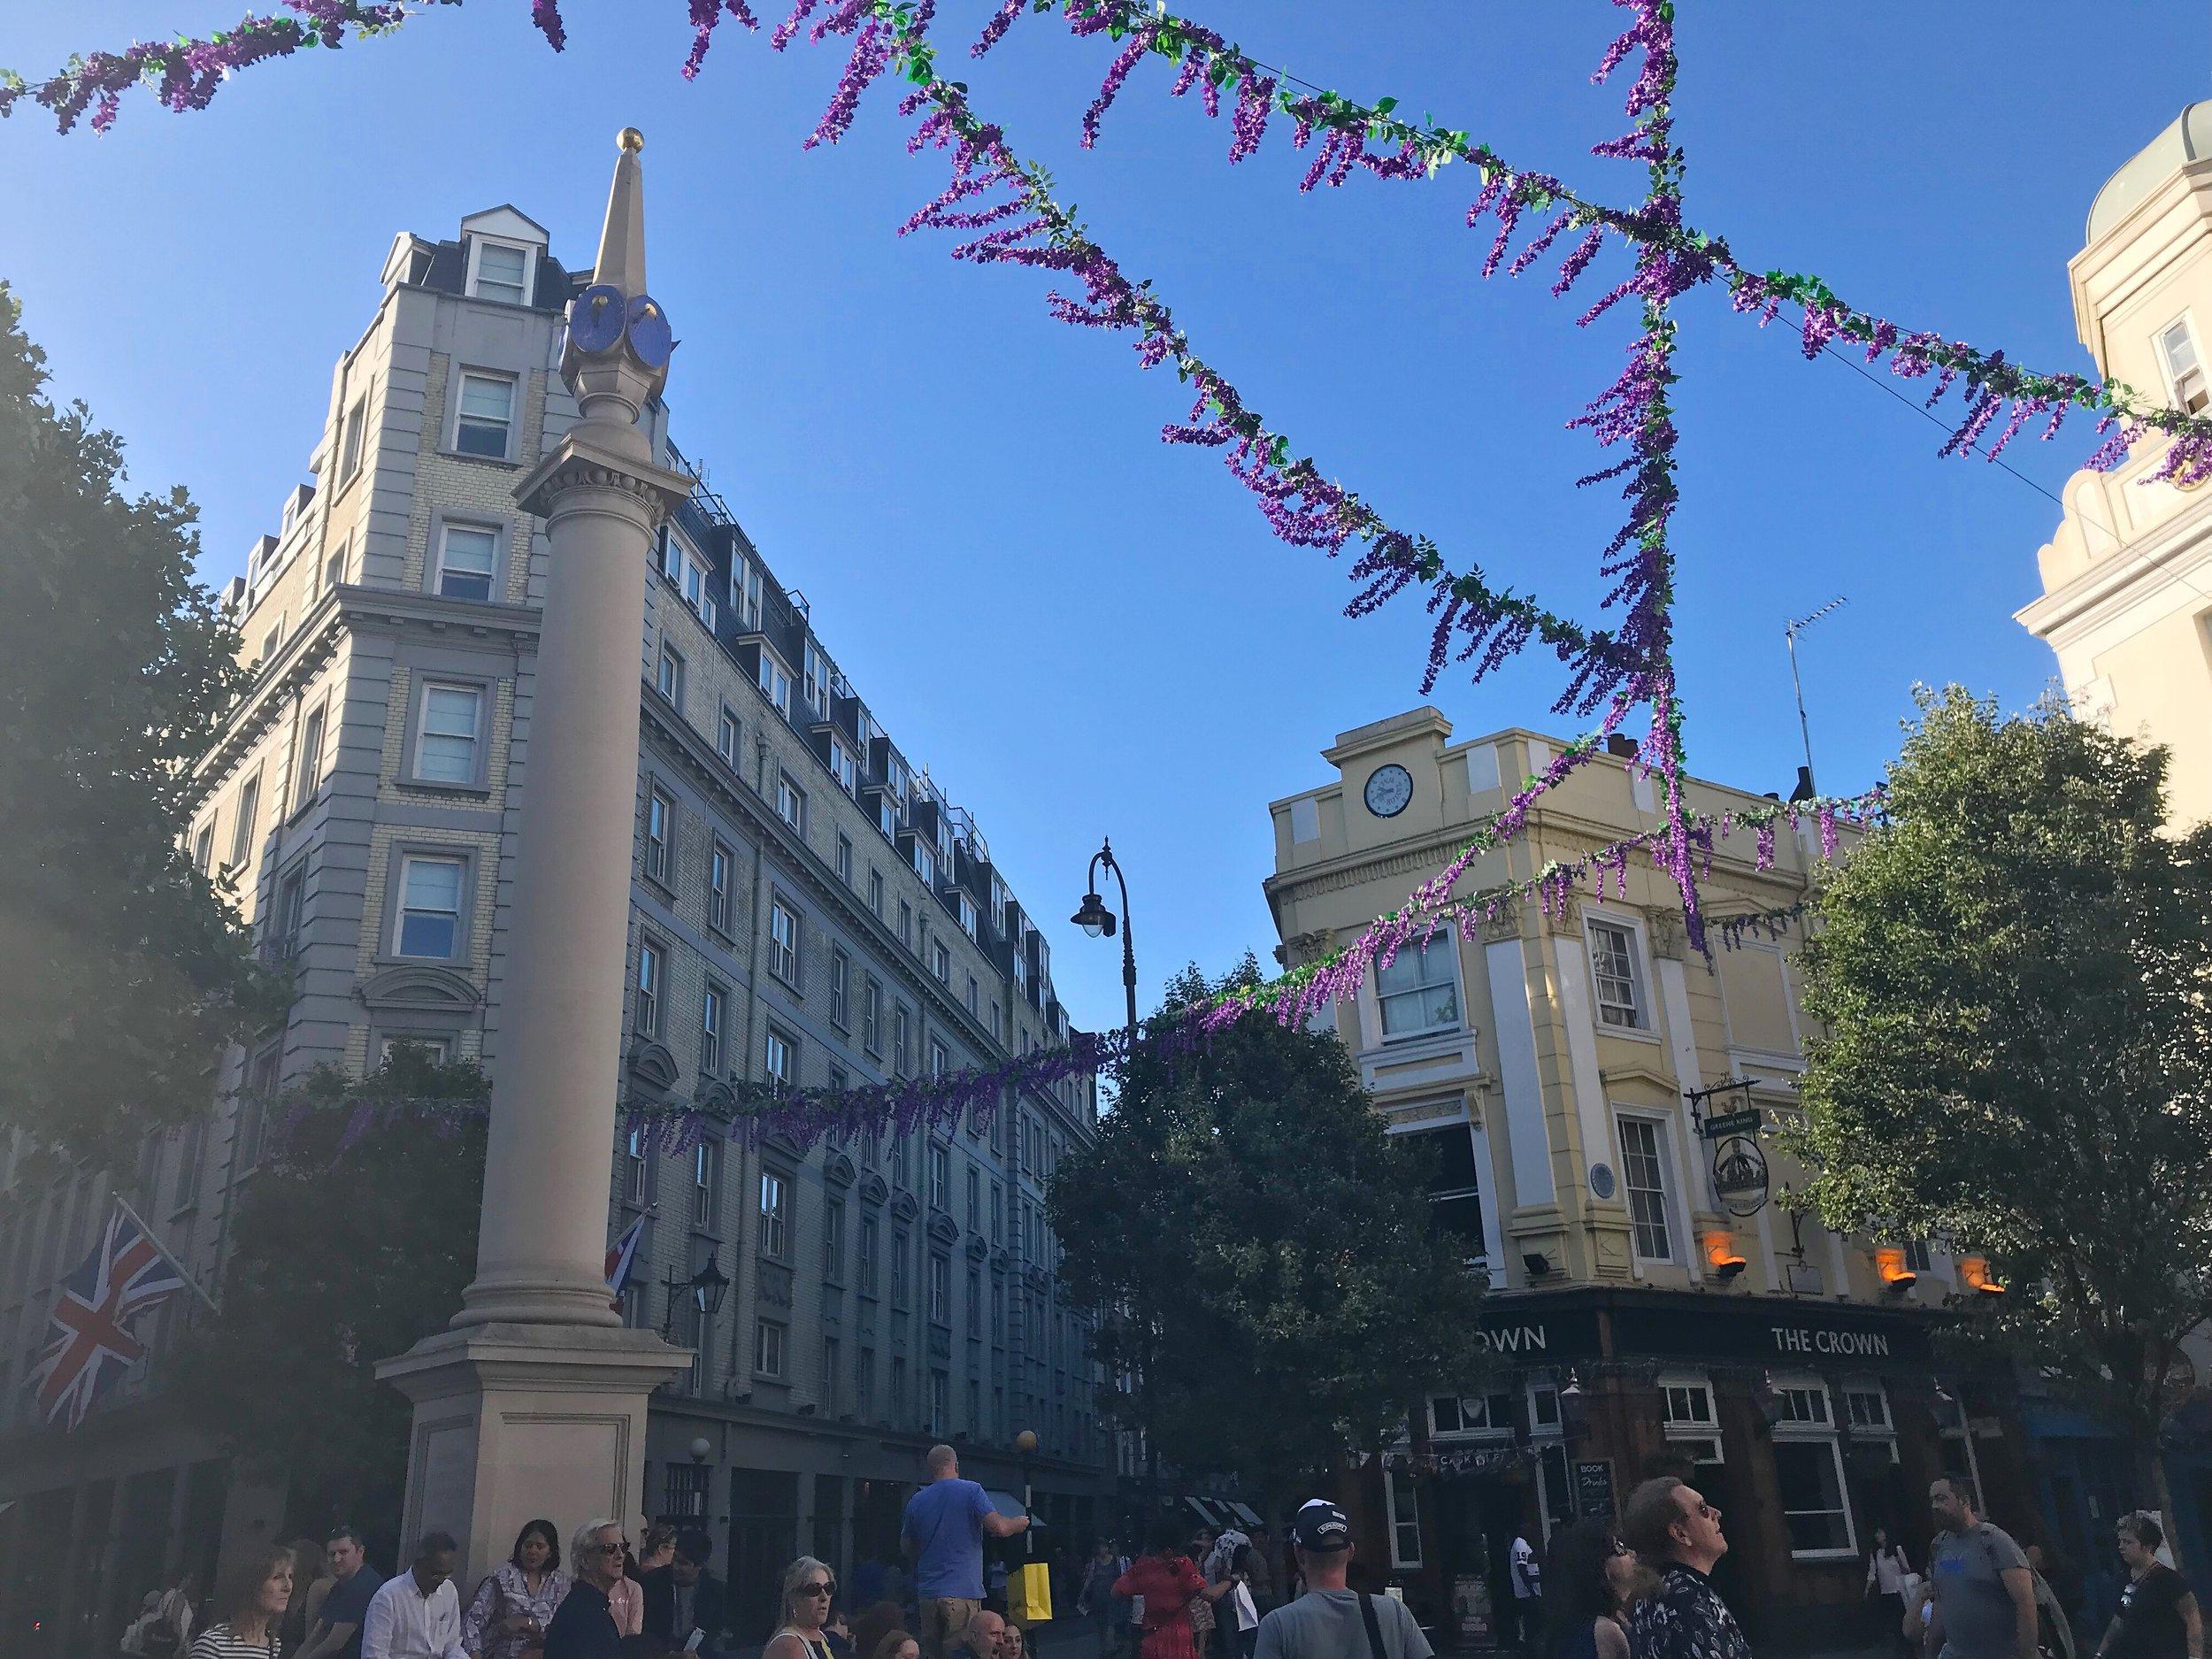 Photo credit: Lucía Ortega